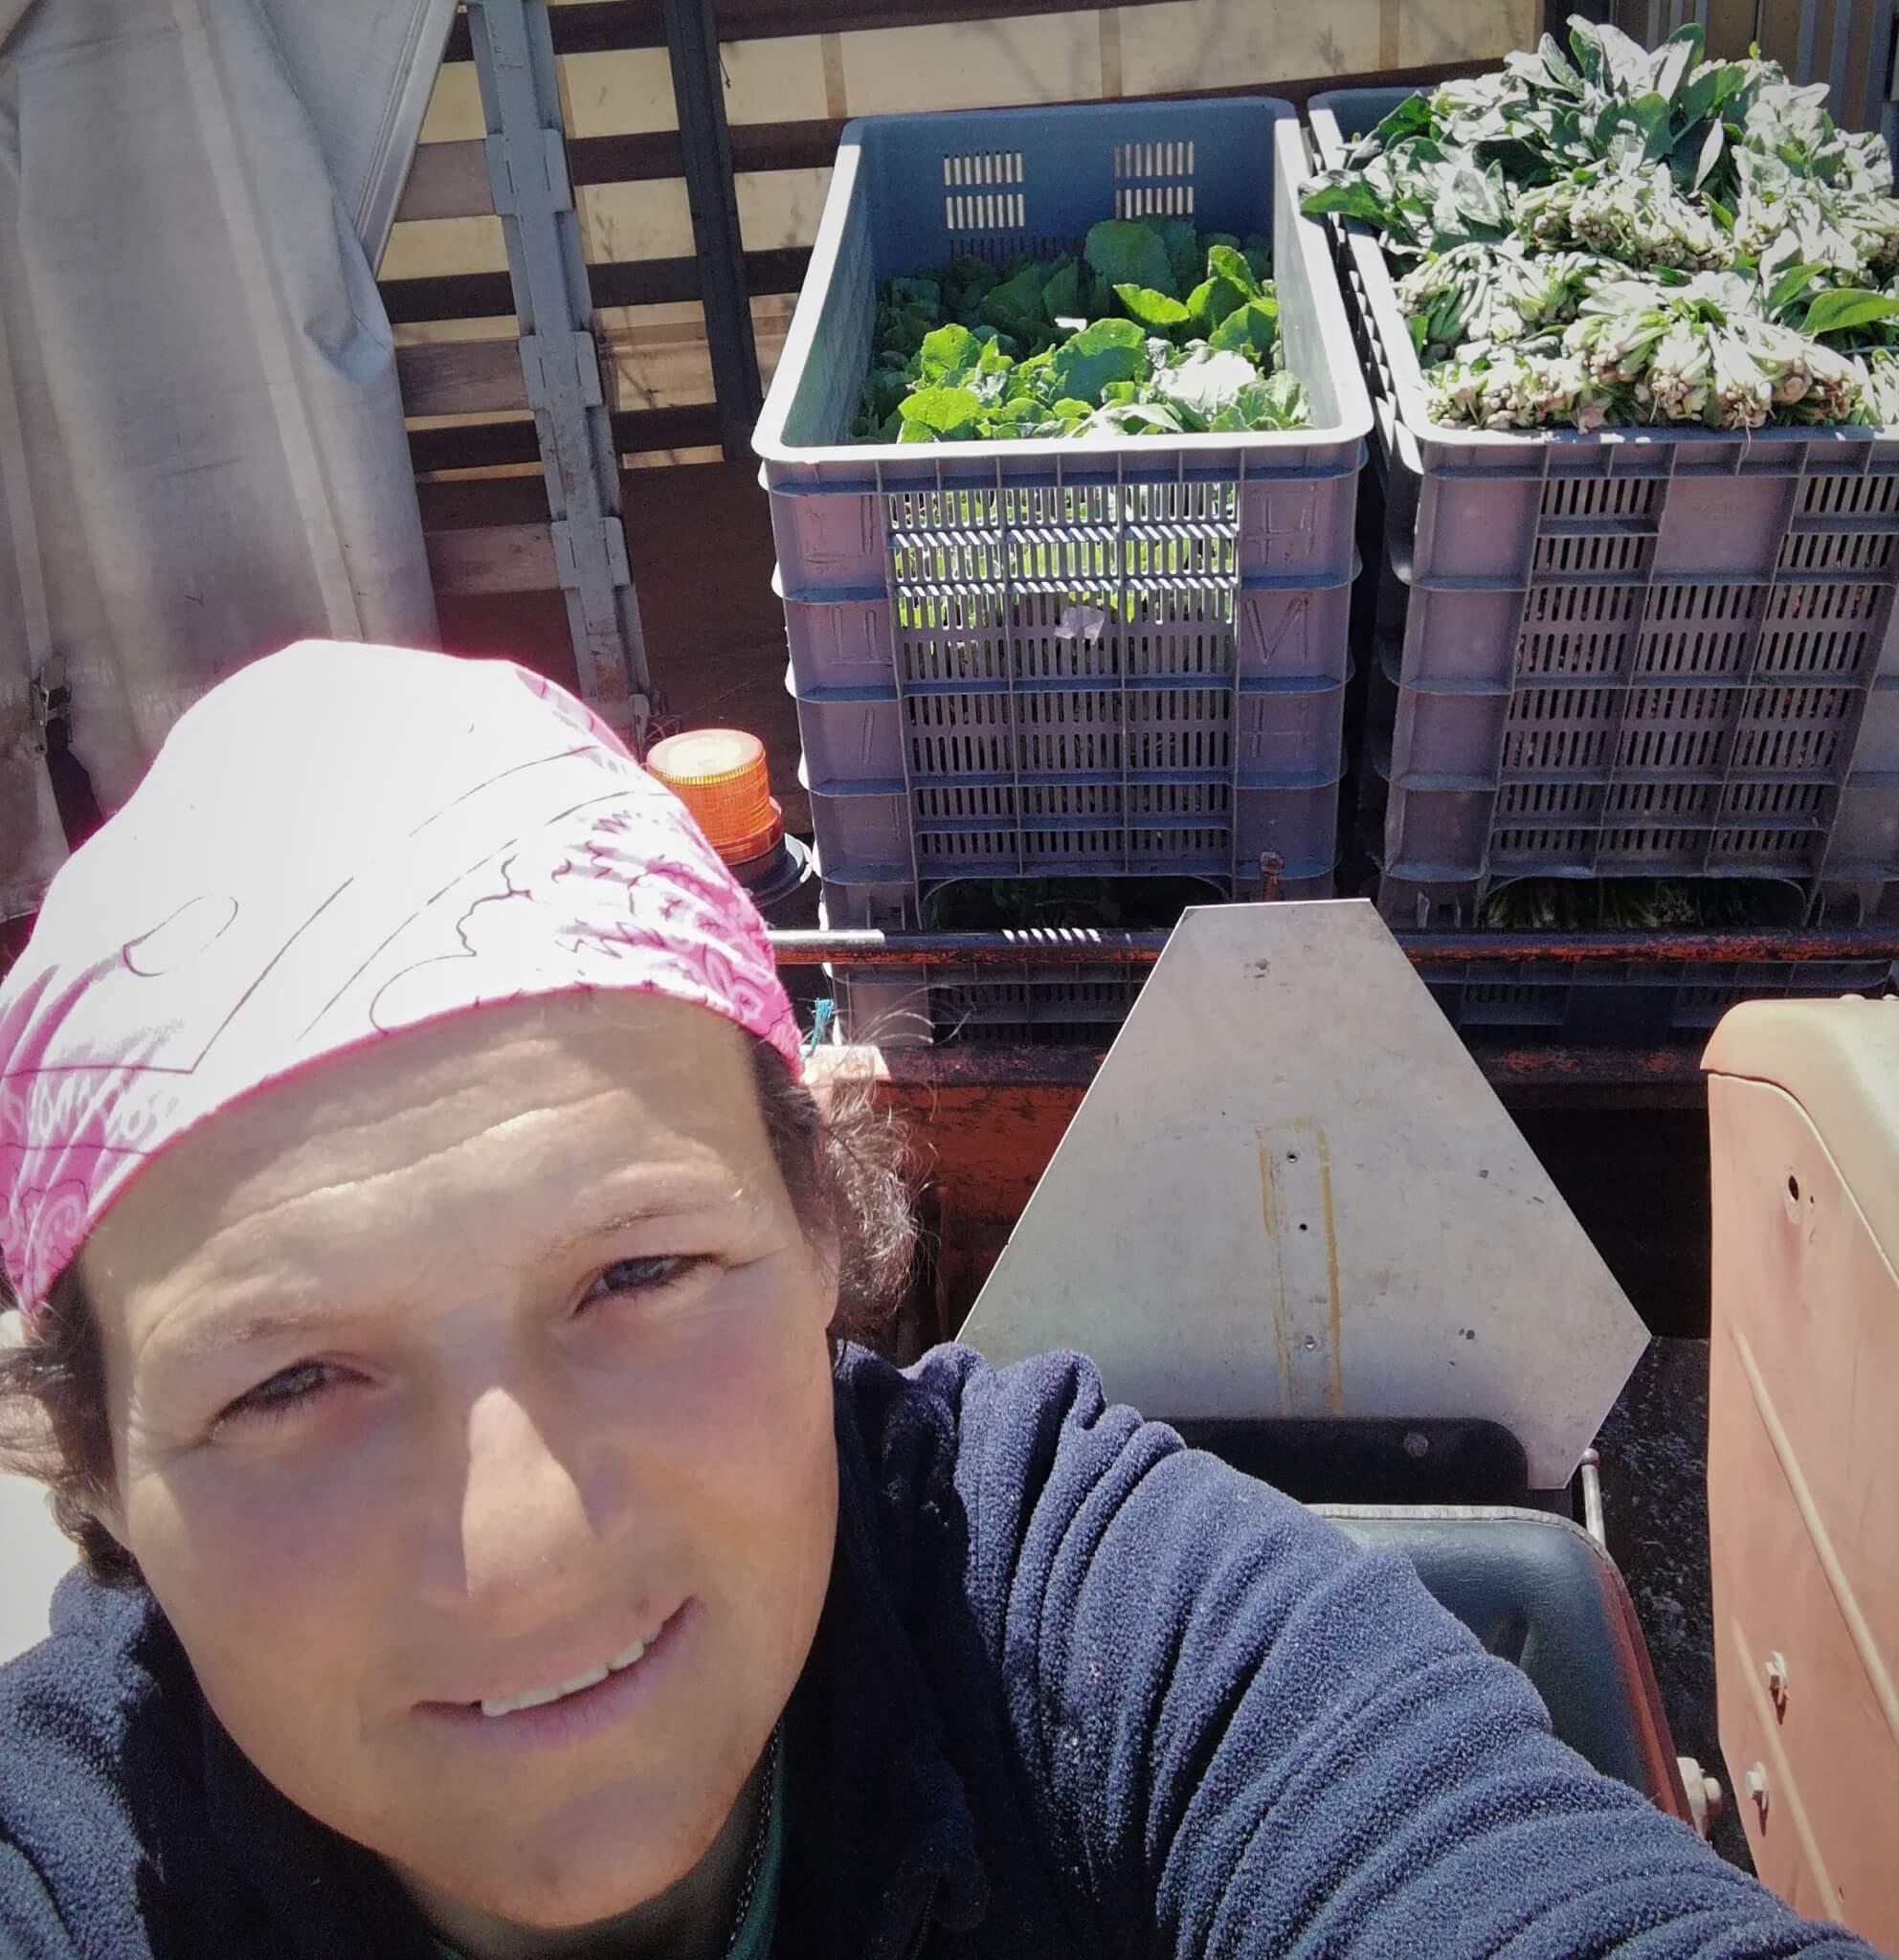 Ana a jovem agricultora